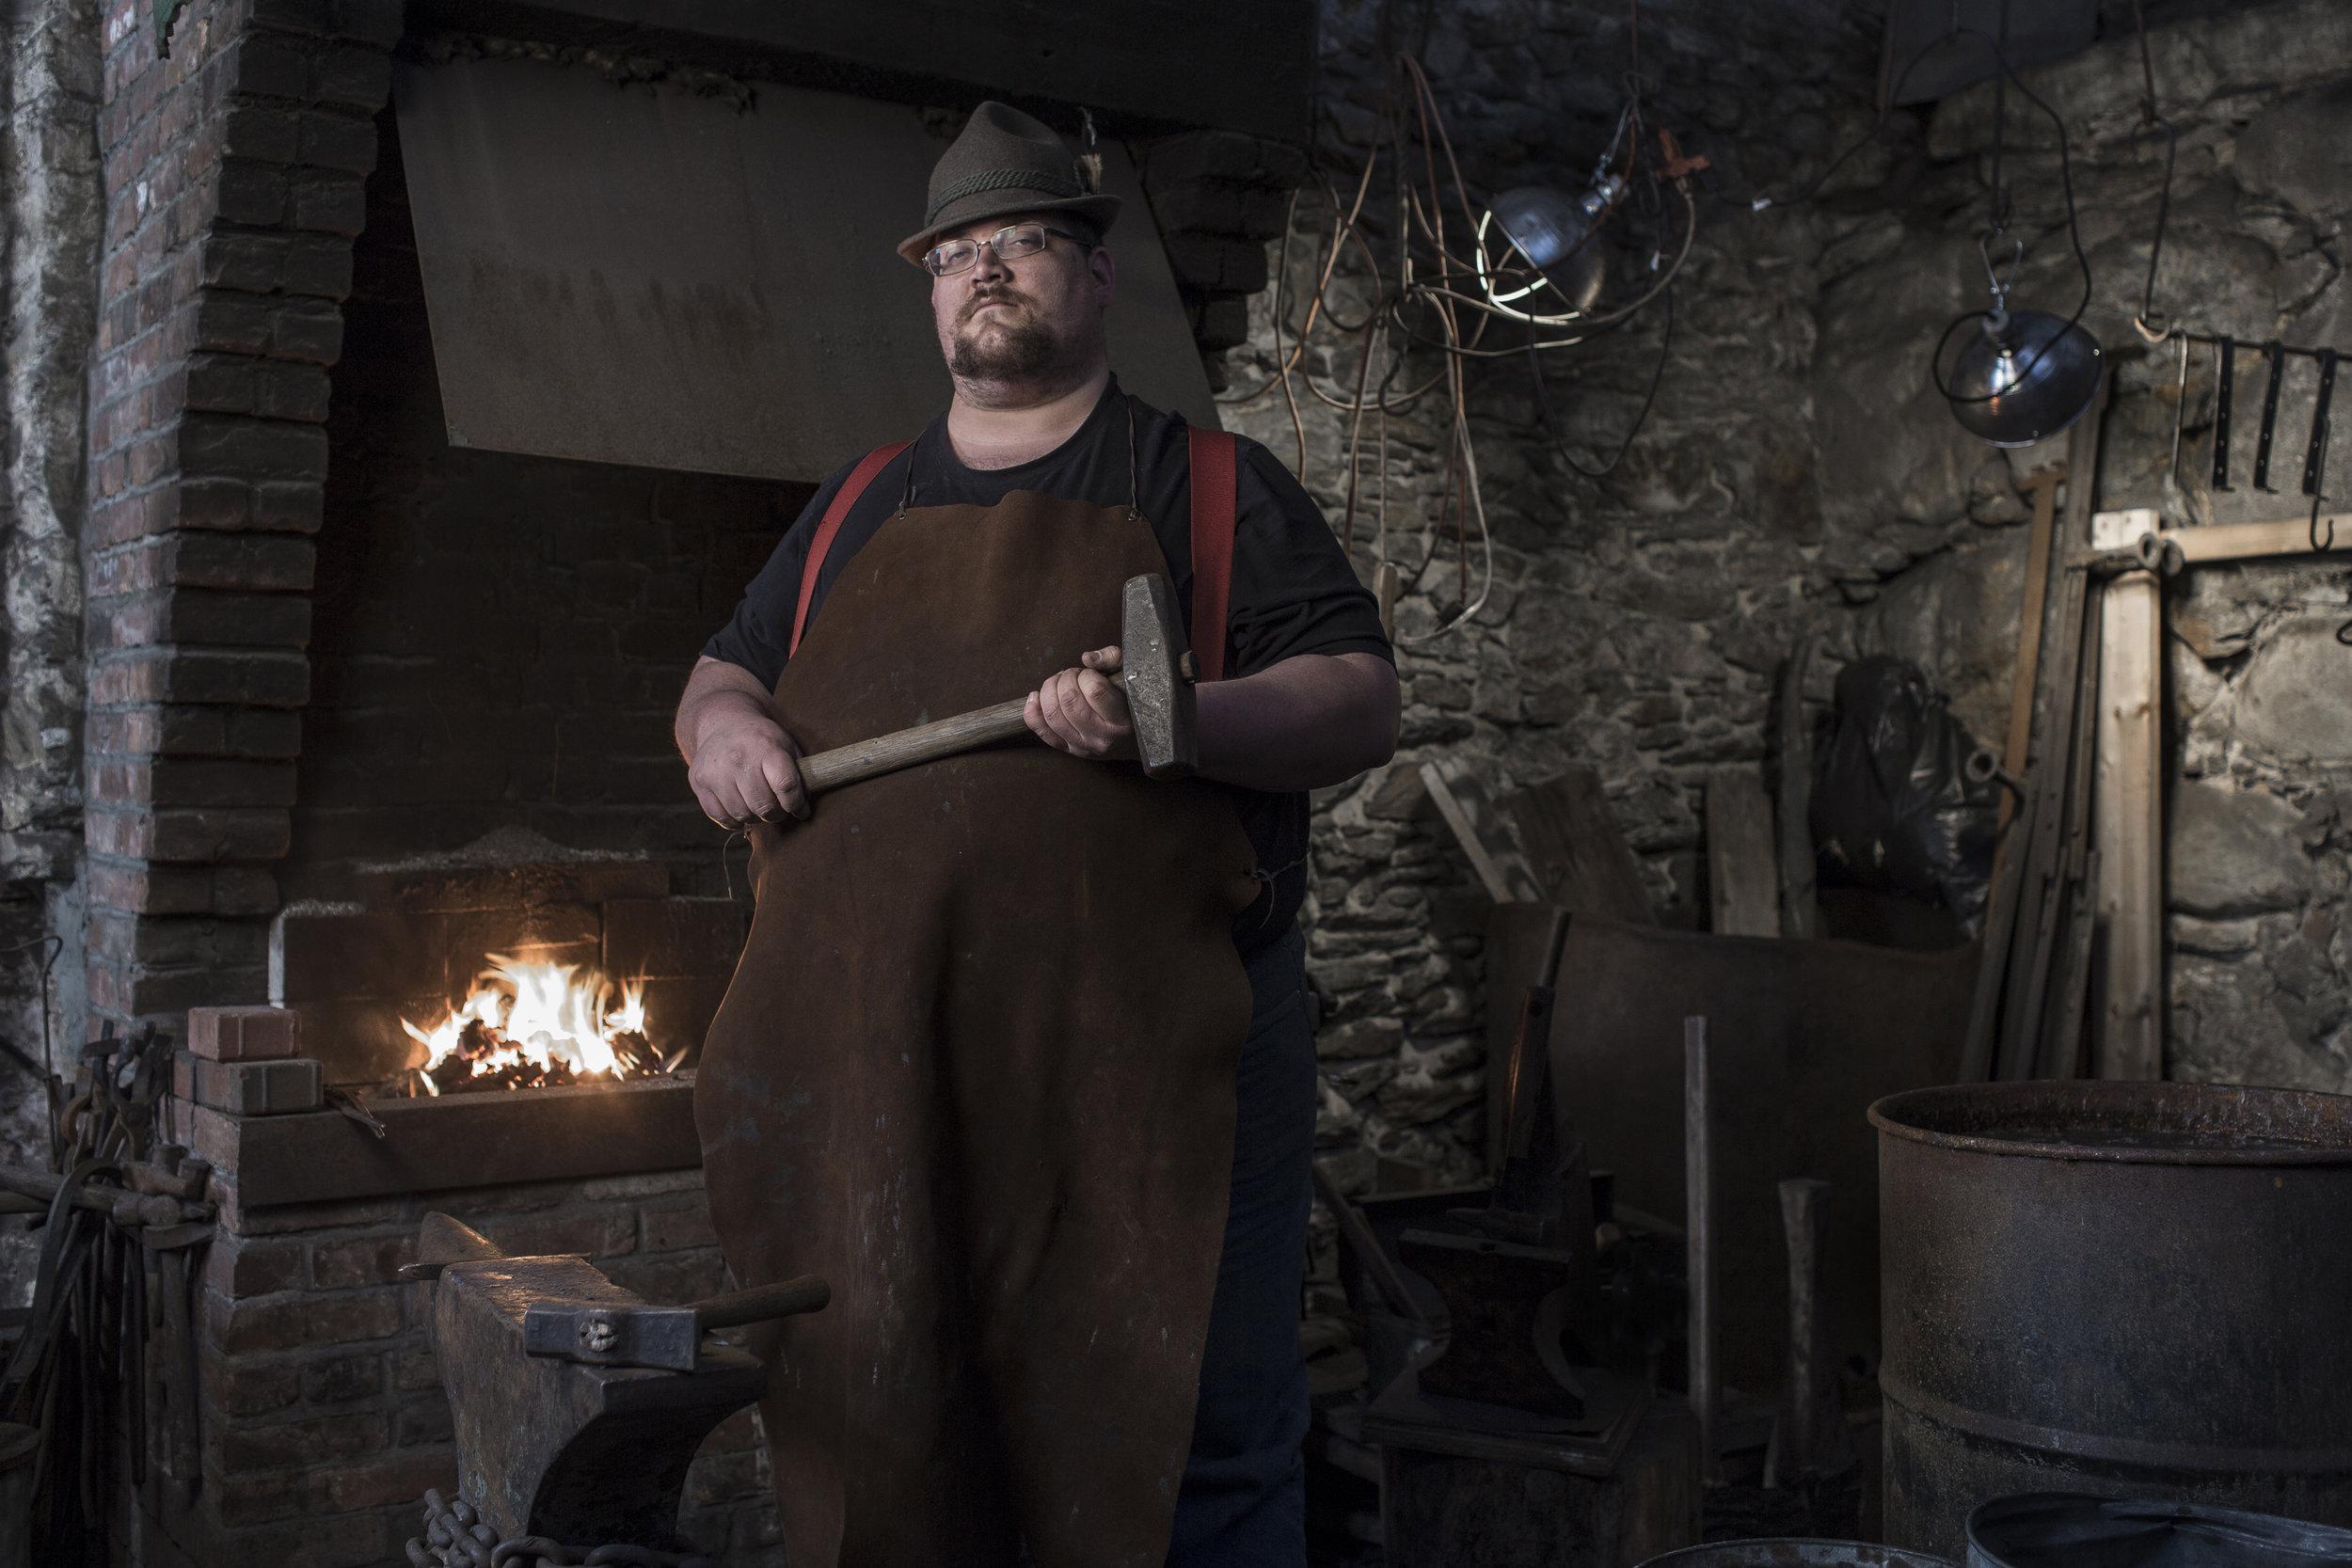 Blacksmith_2-2.jpg